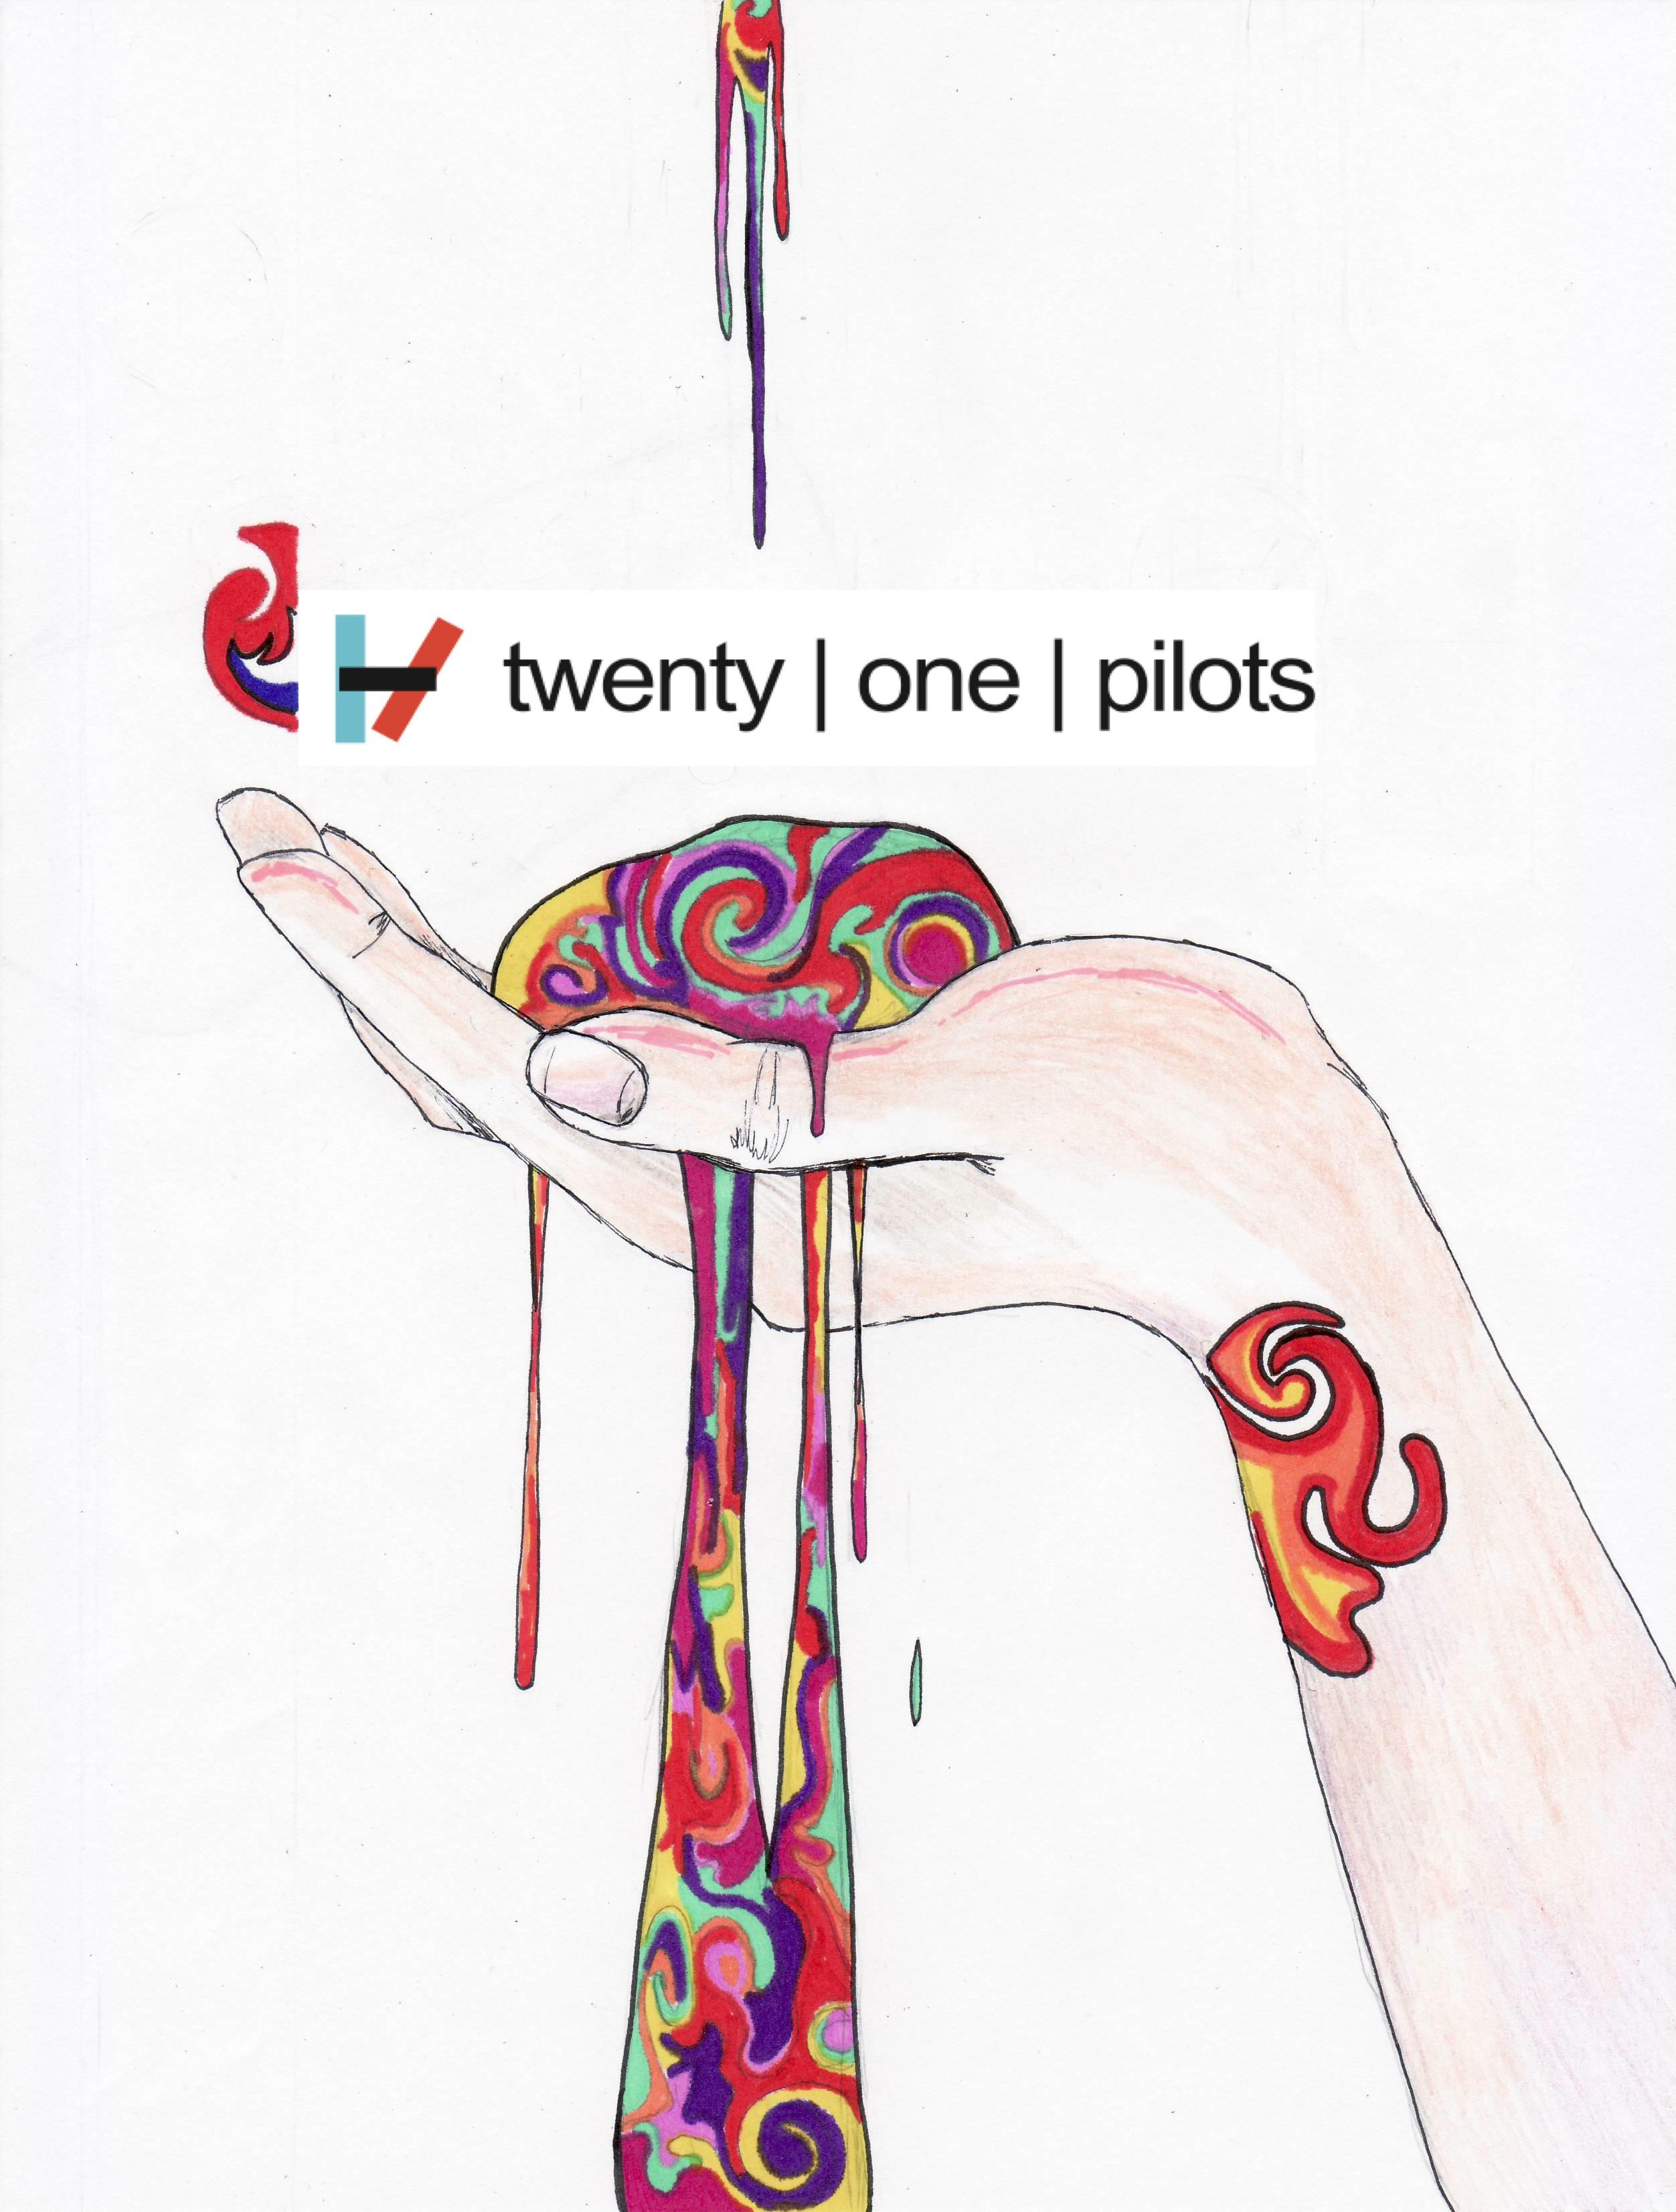 Twenty One Pilots - image 1 - student project